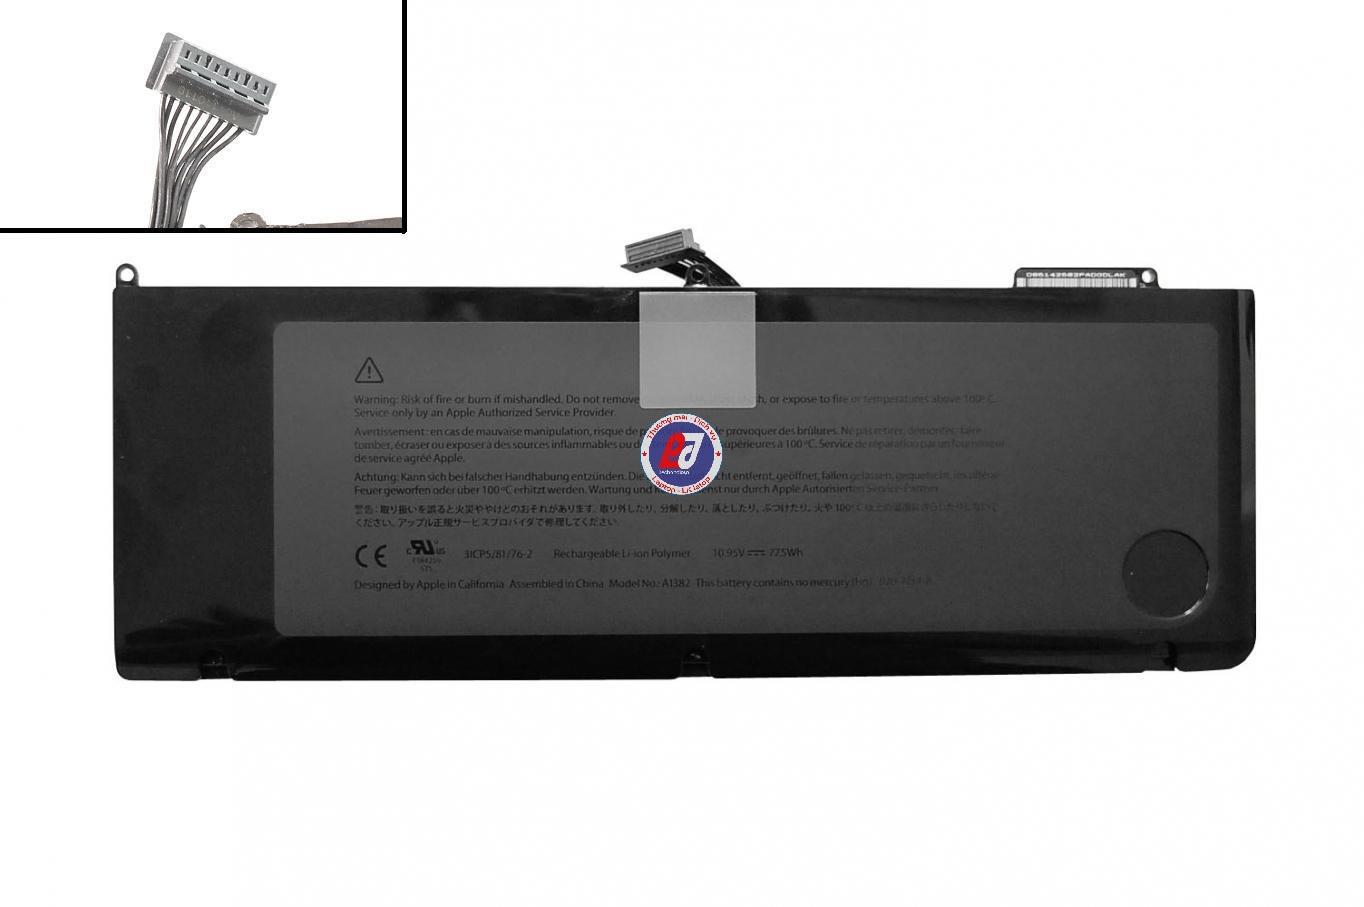 thay Pin macbook A1382 pro unibody 15inch A1286